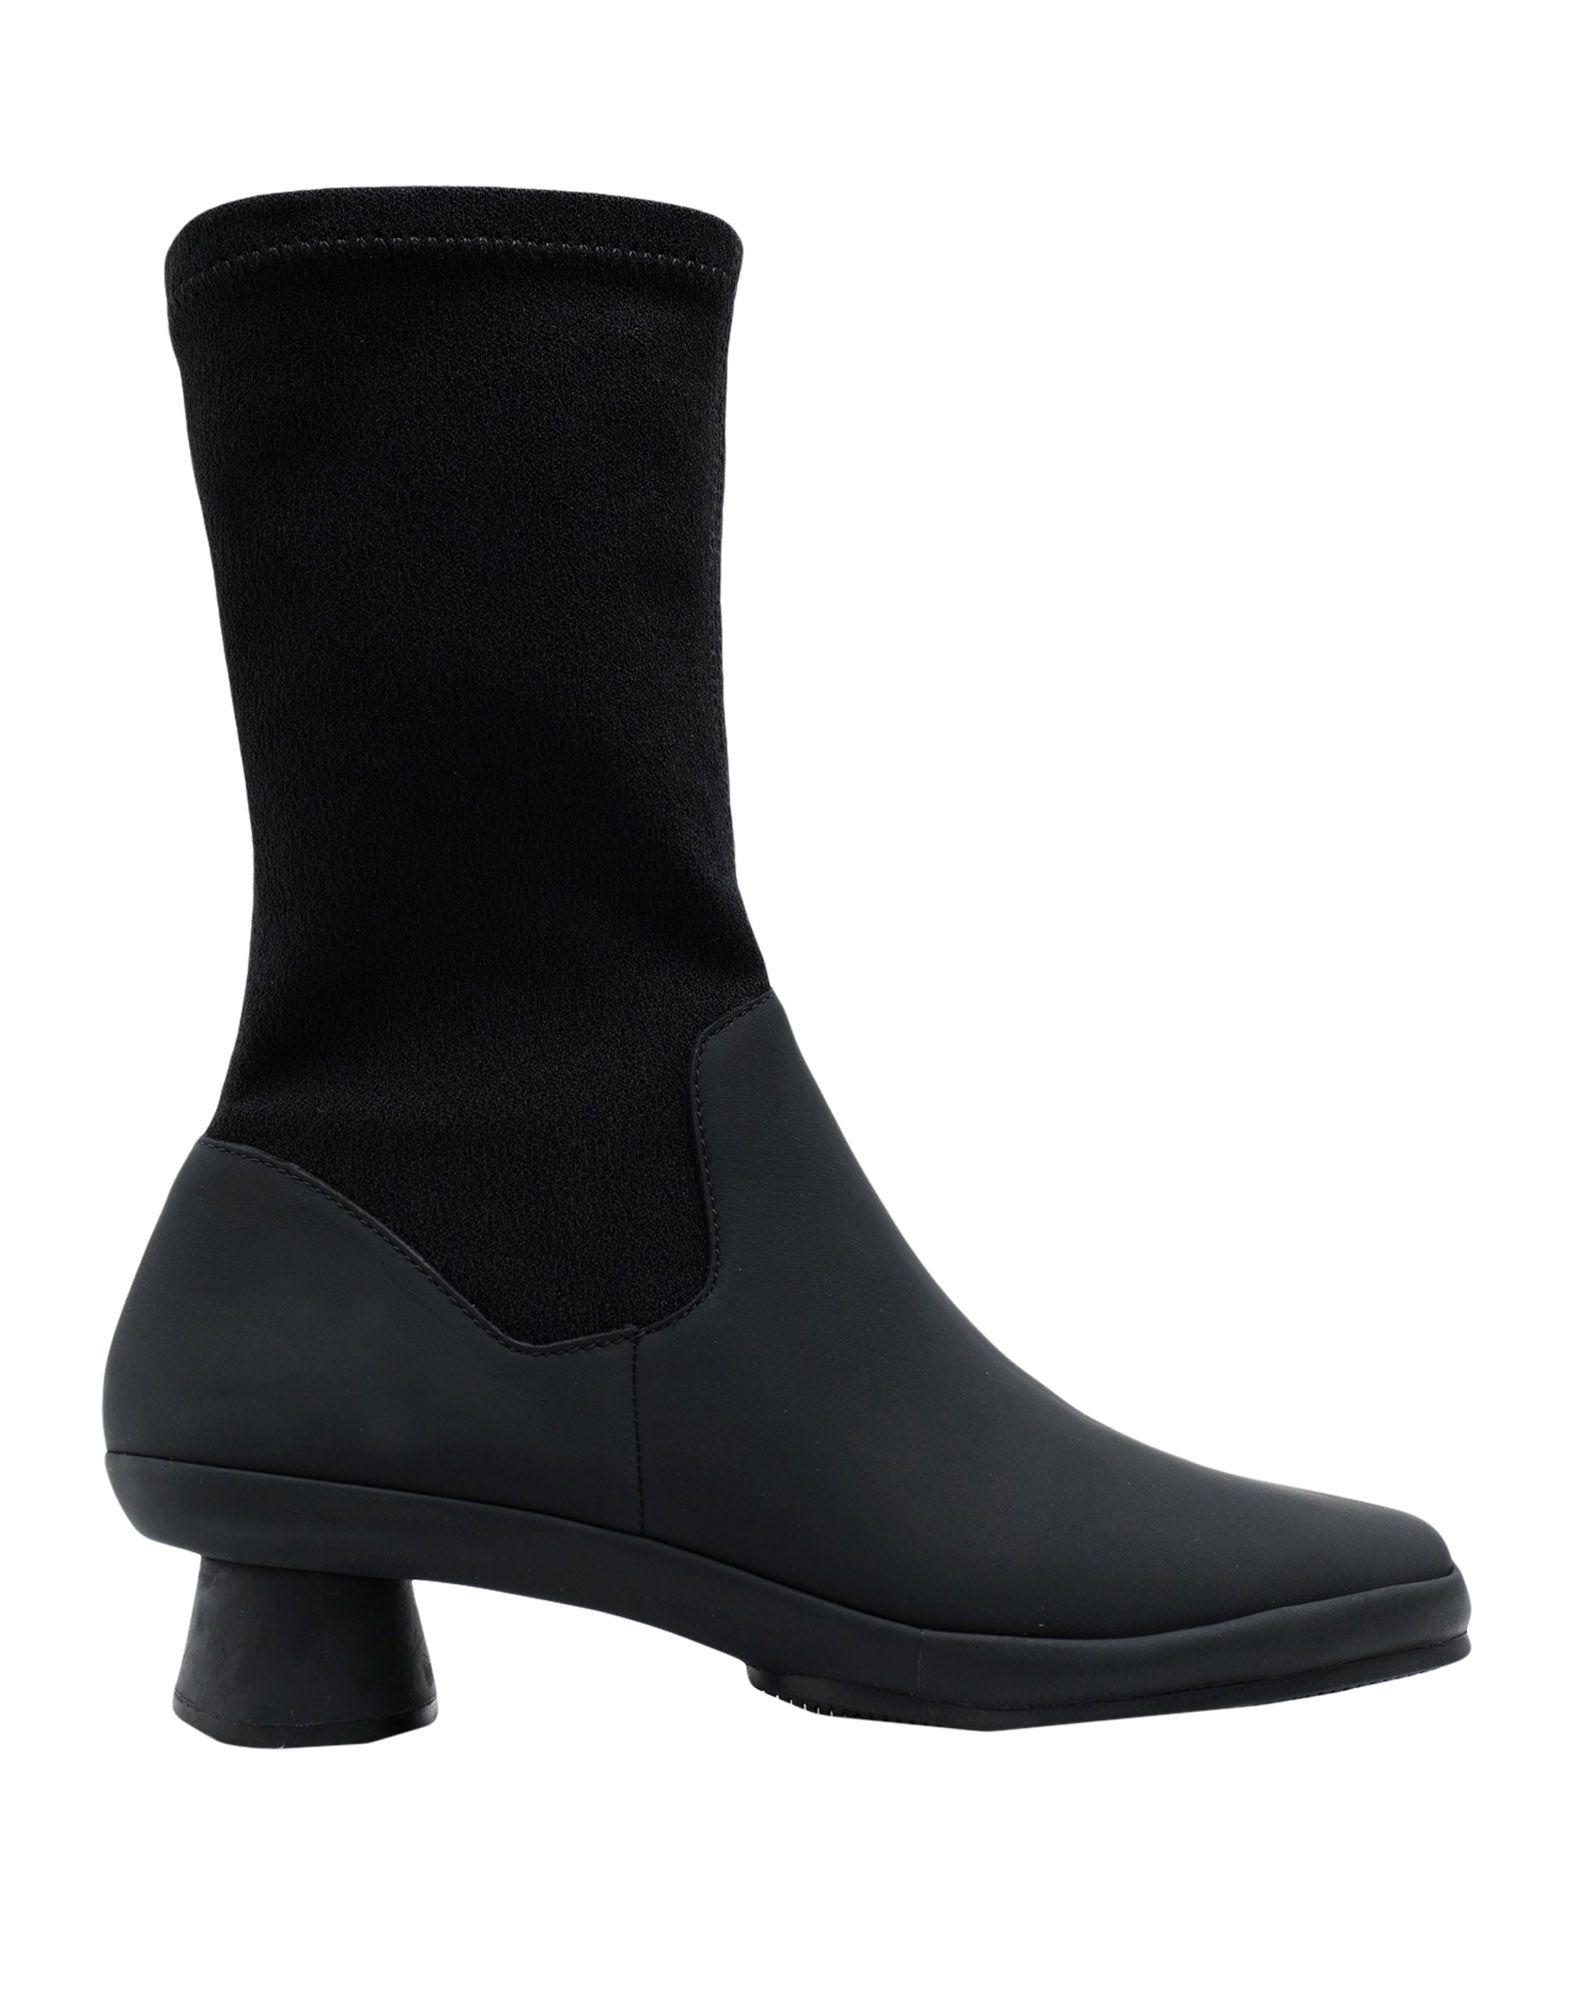 Stilvolle billige Schuhe Camper Stiefelette 11555852MC Damen  11555852MC Stiefelette 263895